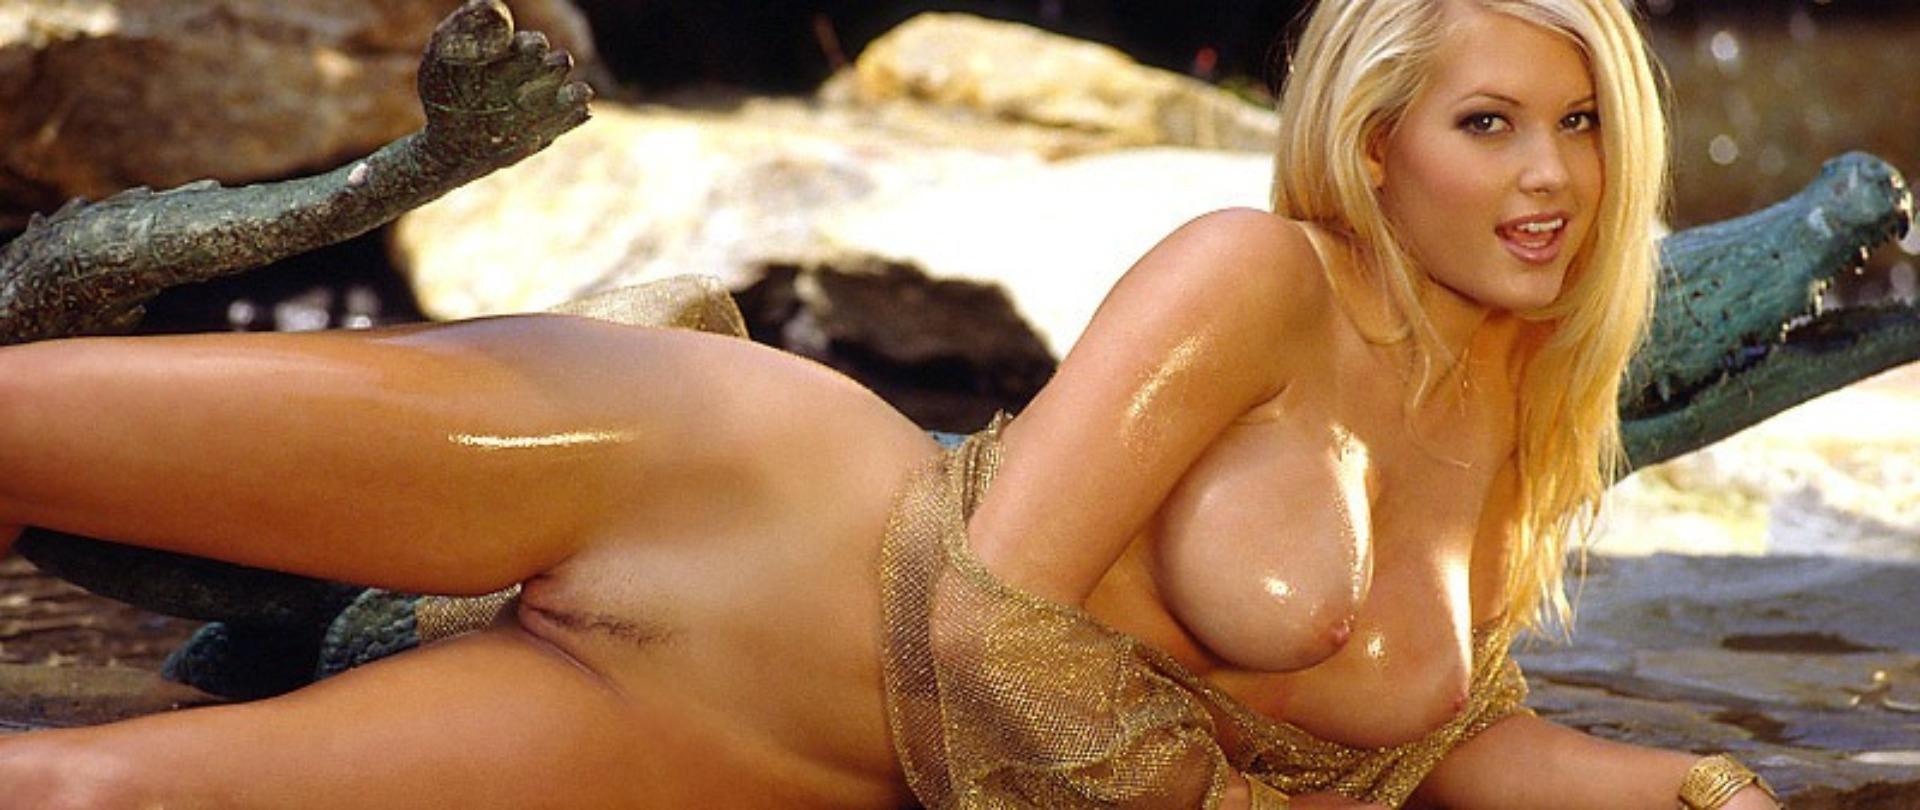 Suzanne stokes nude